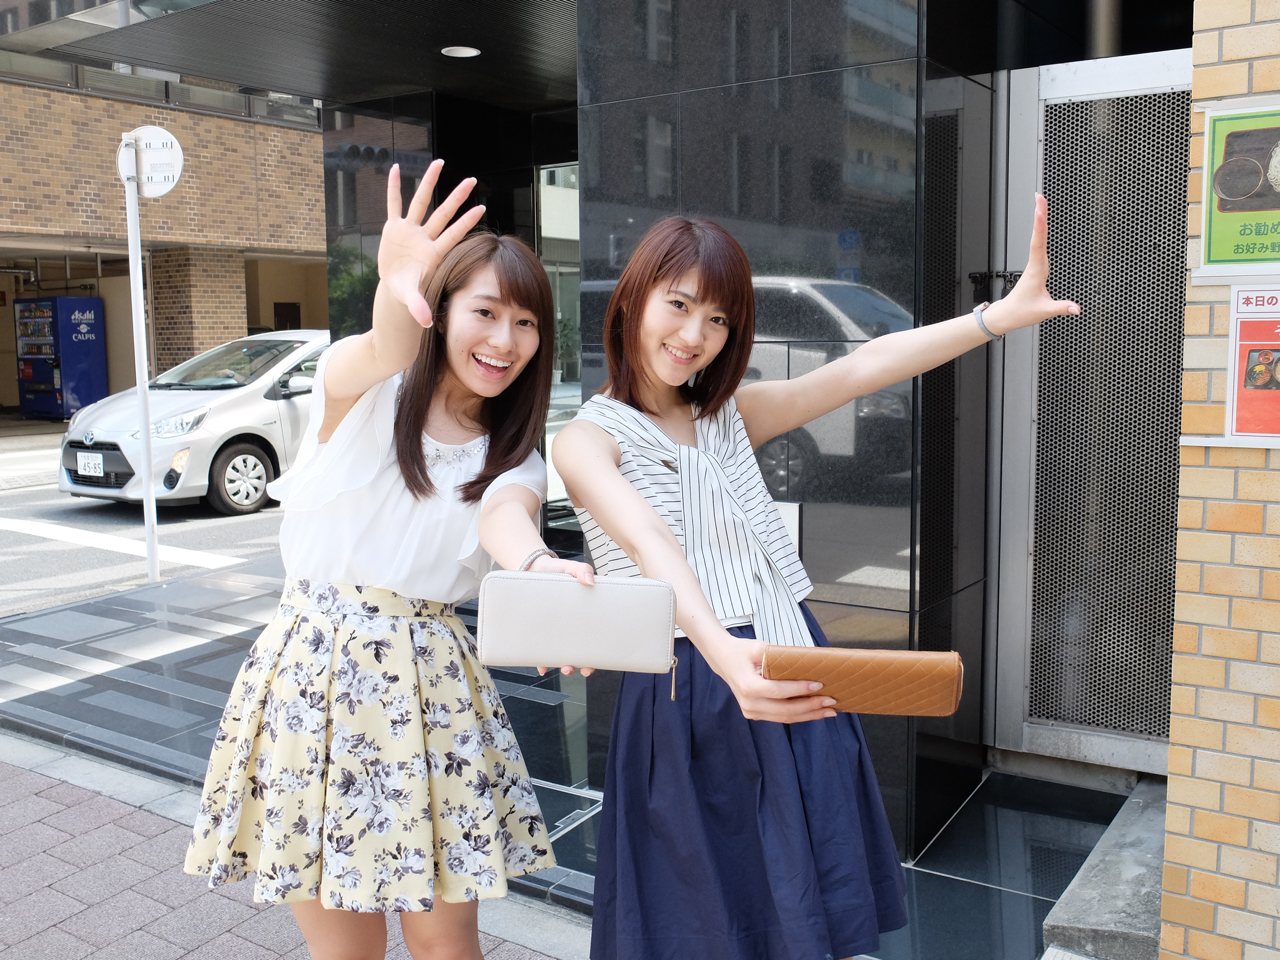 20160723_sakuraiwakatsuki6_offshot_toukou